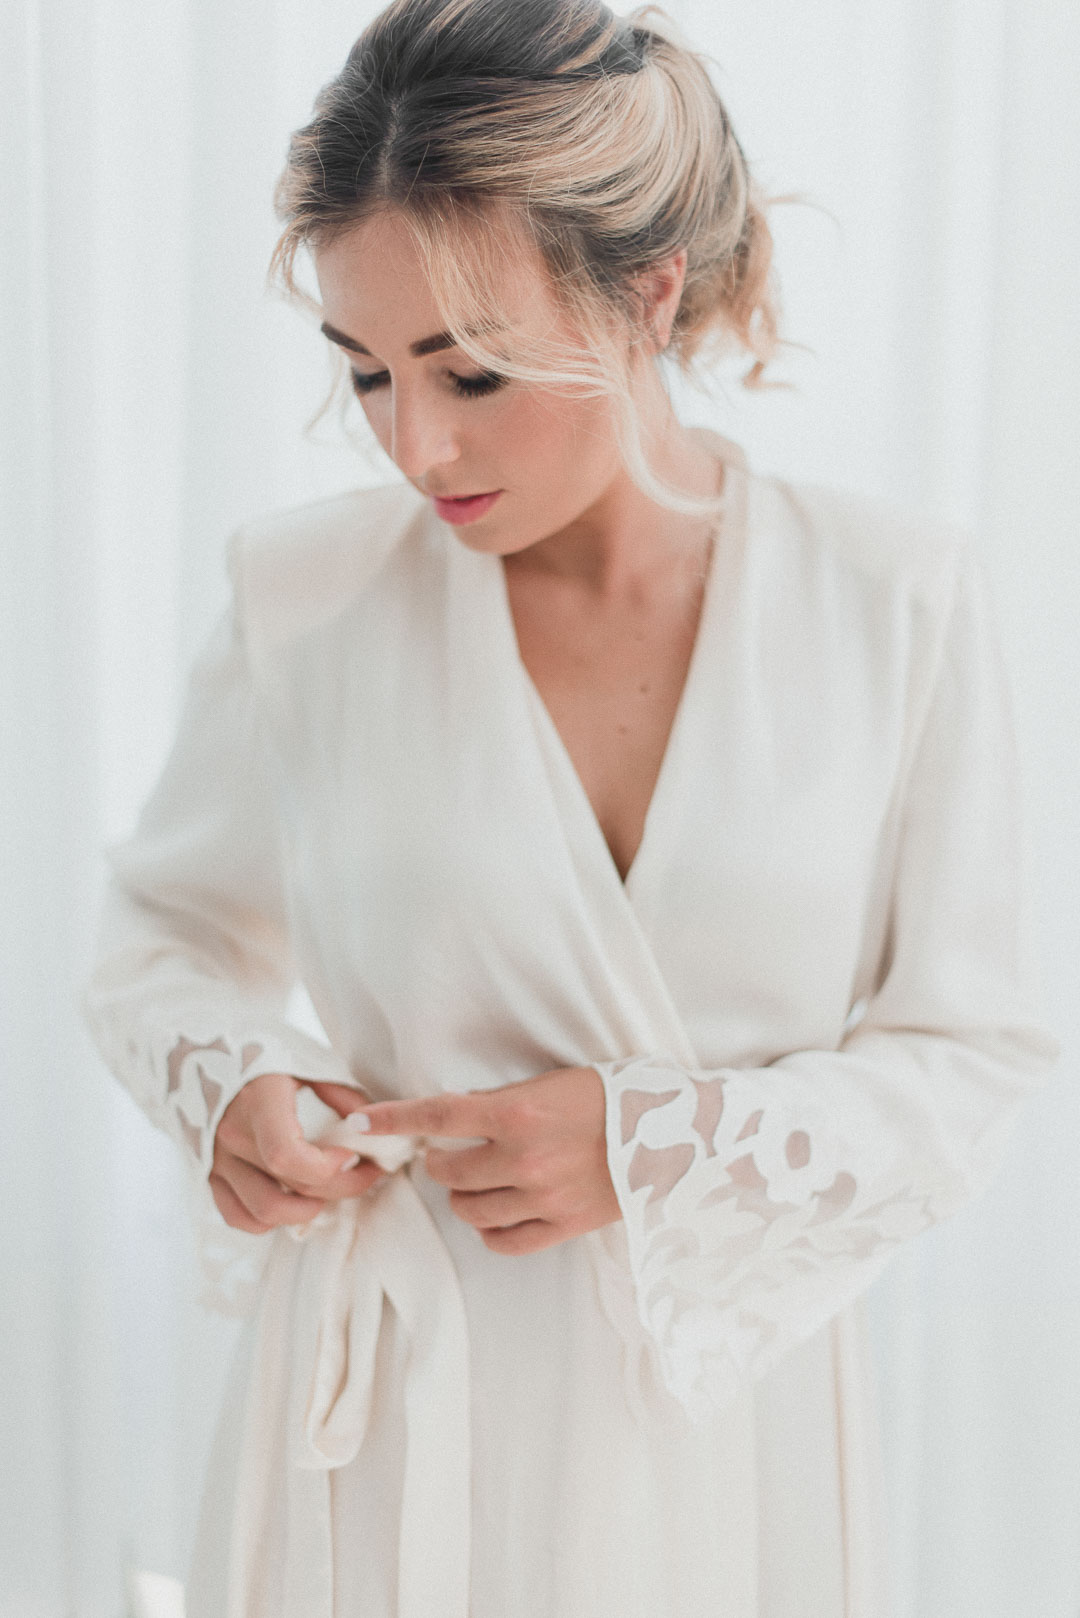 vivianeizzo-spazio46-wedding-photographer-destination-reportage-napoli-villacilento-14